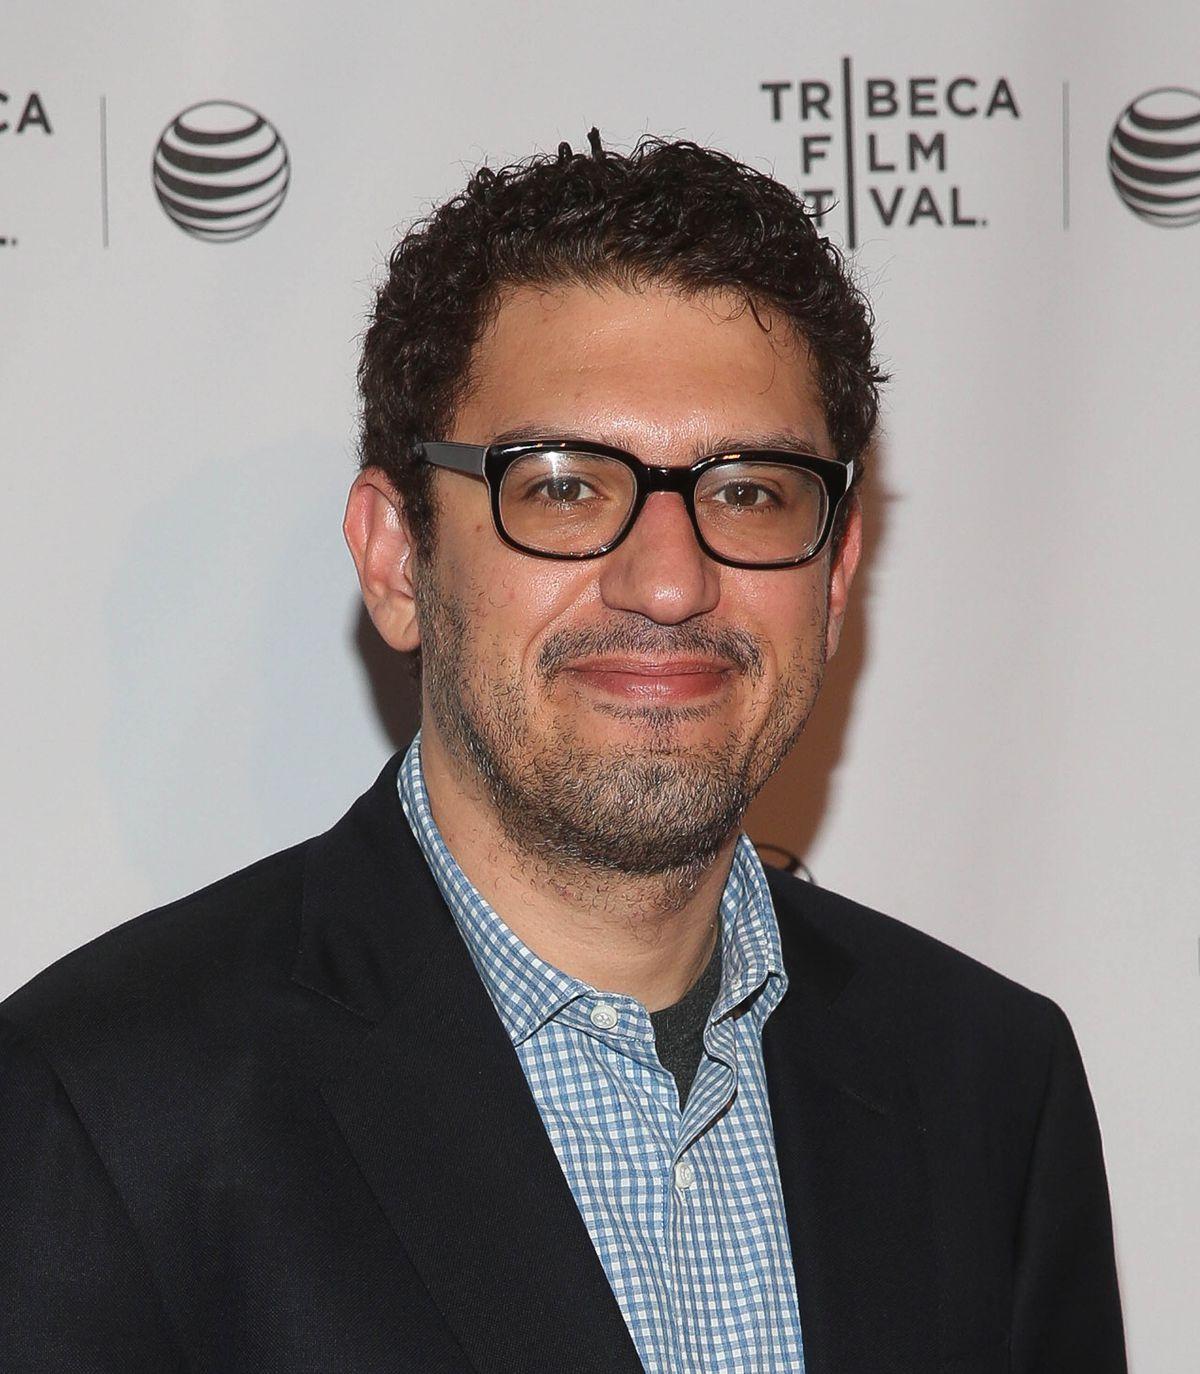 Tribeca Talks After The Movie: Mr. Robot - 2015 Tribeca Film Festival